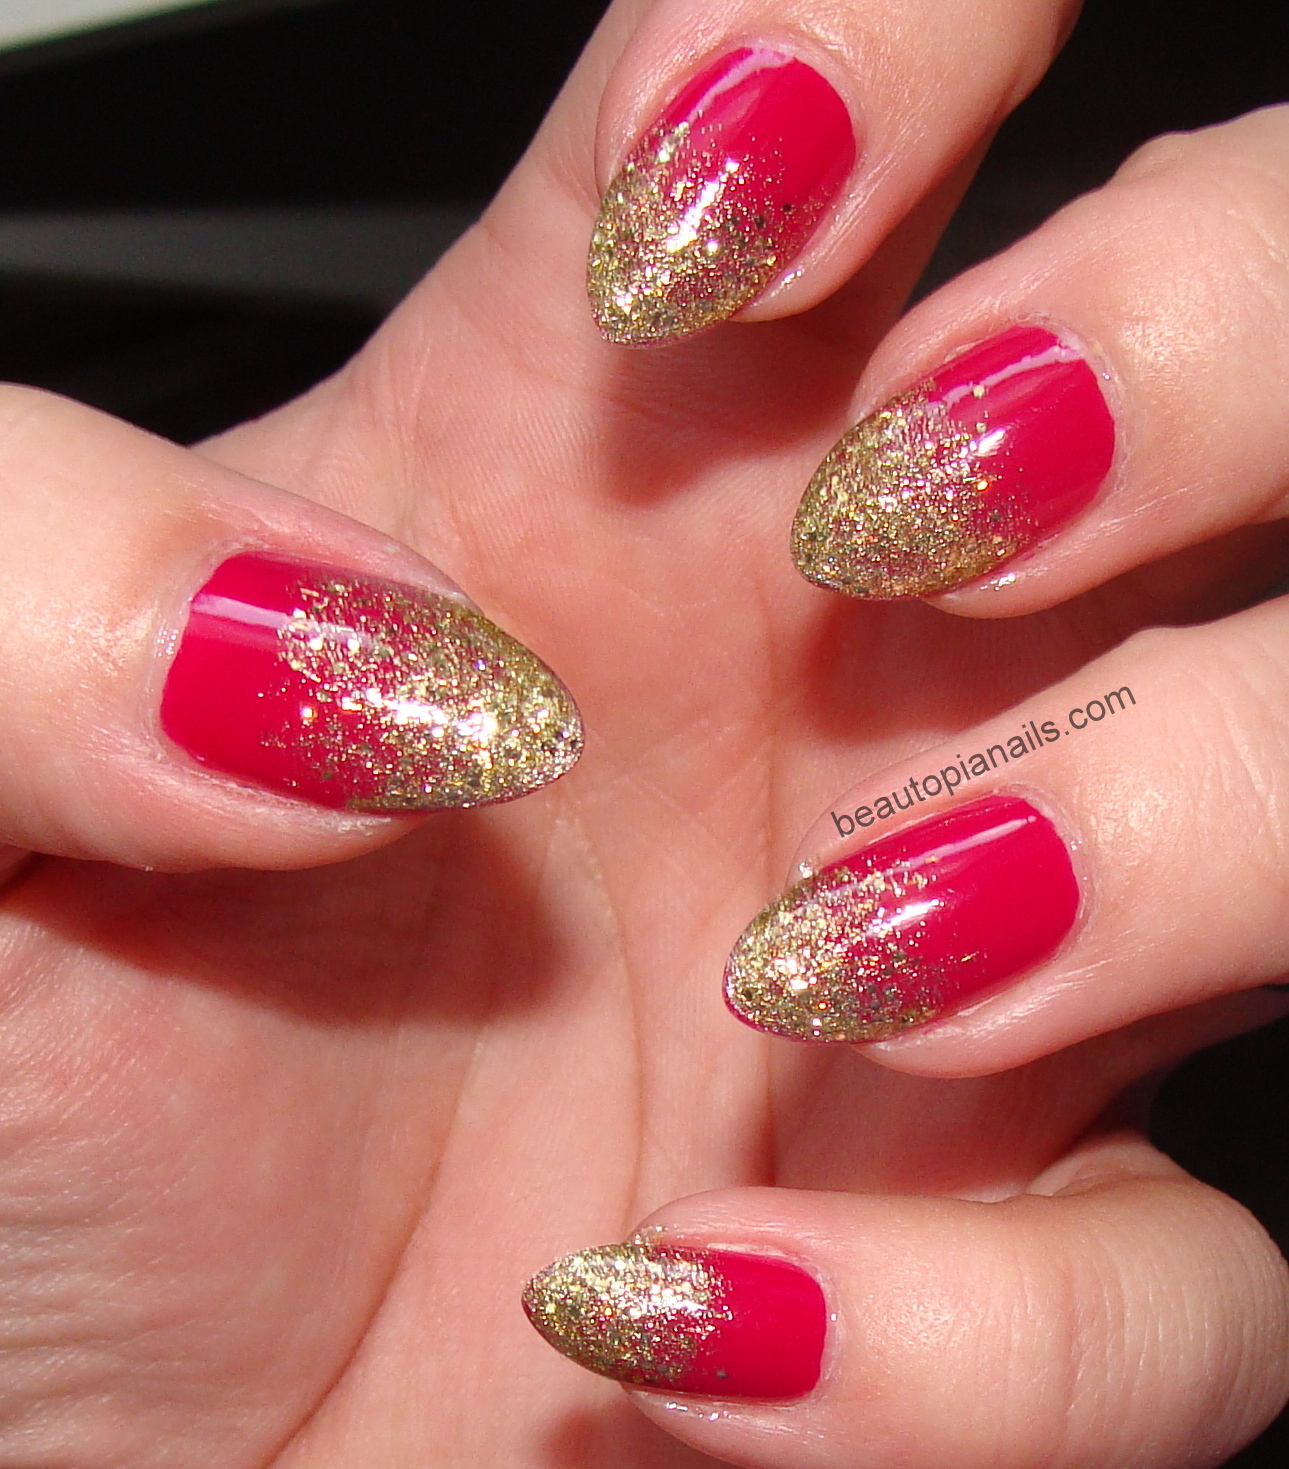 Nail Art Games For Free: Nail Glitter Games#*^